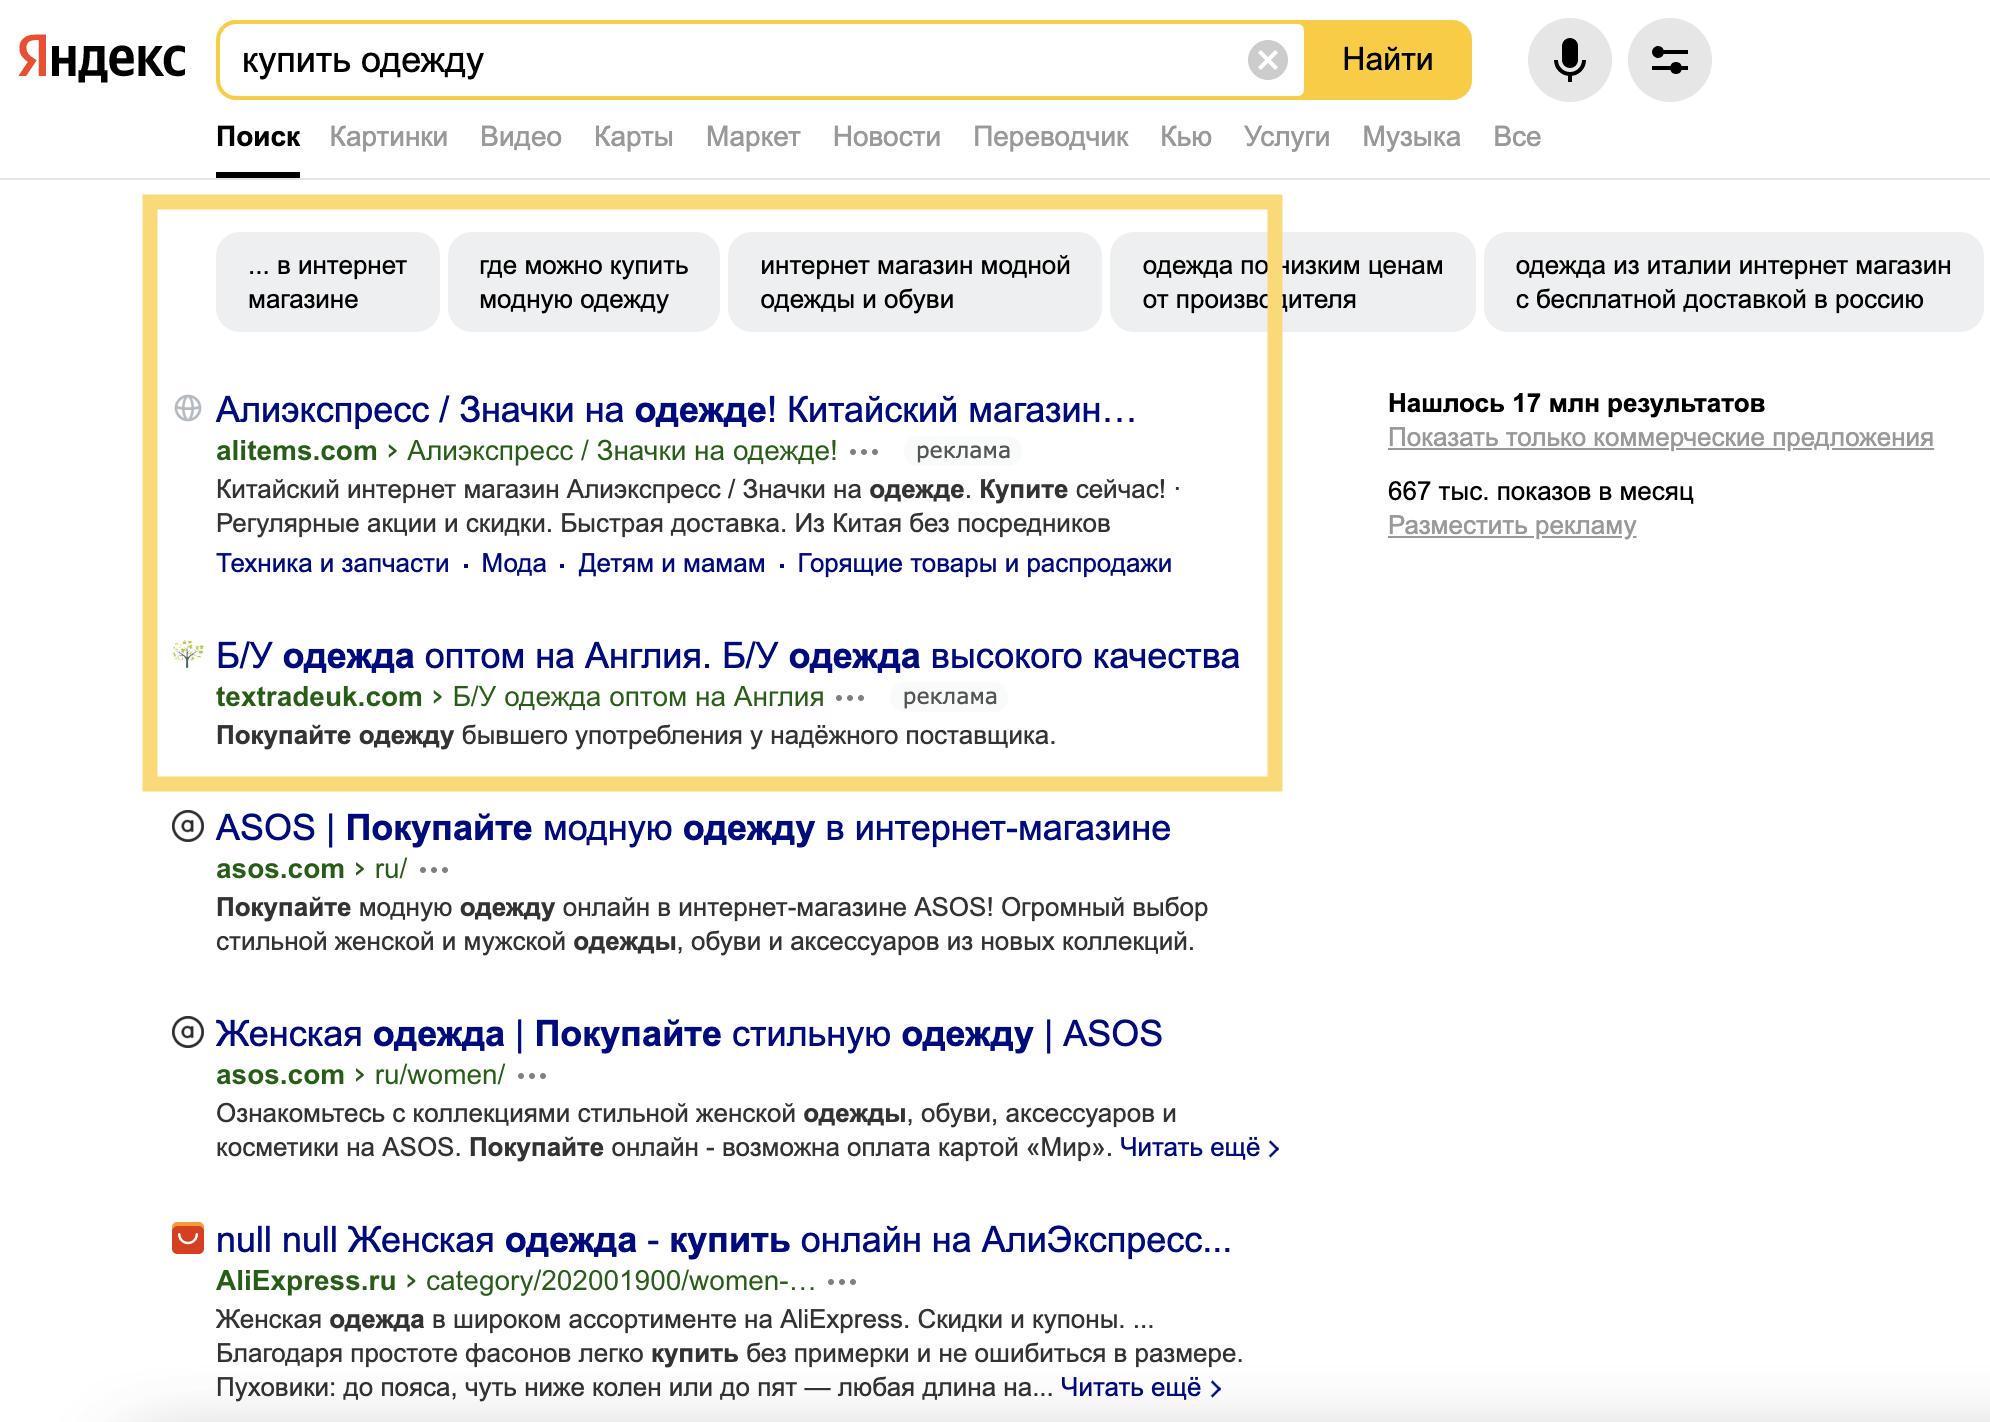 Yandex reklama